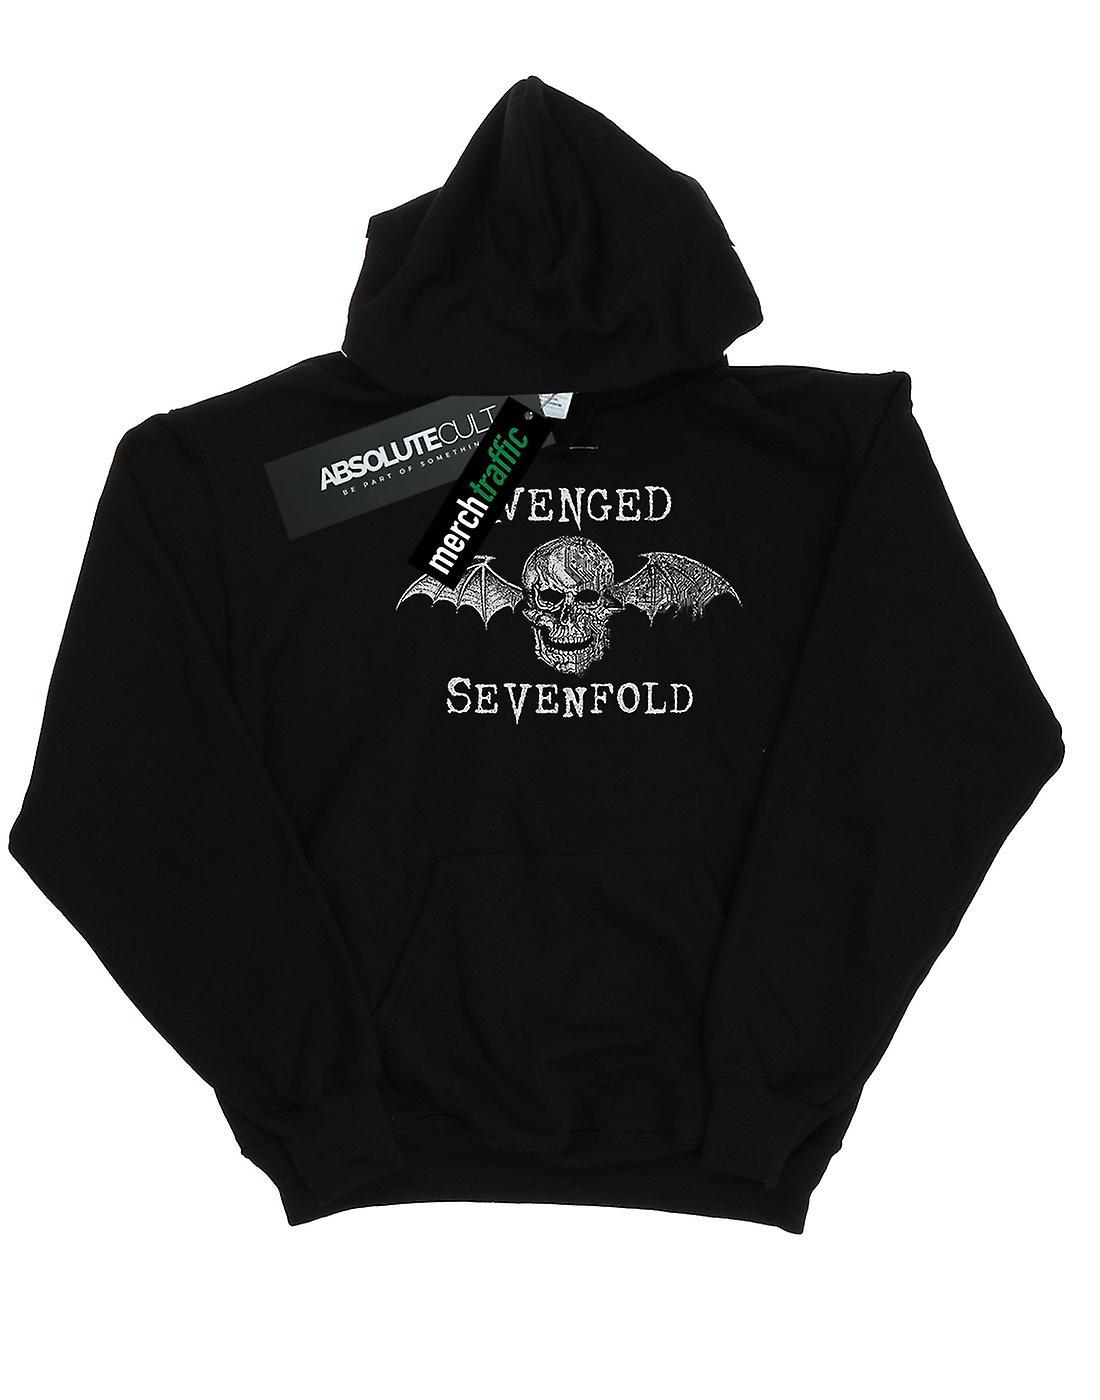 Avenged Sevenfold Women's Cyborg Deathbat Hoodie